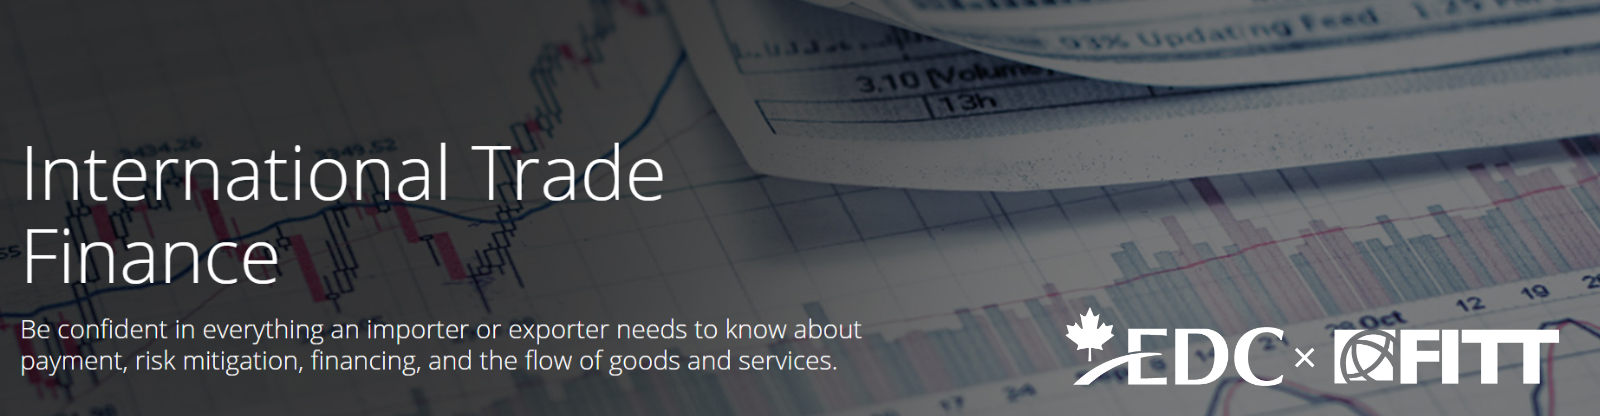 International Trade Finance FITTskills Course Banner